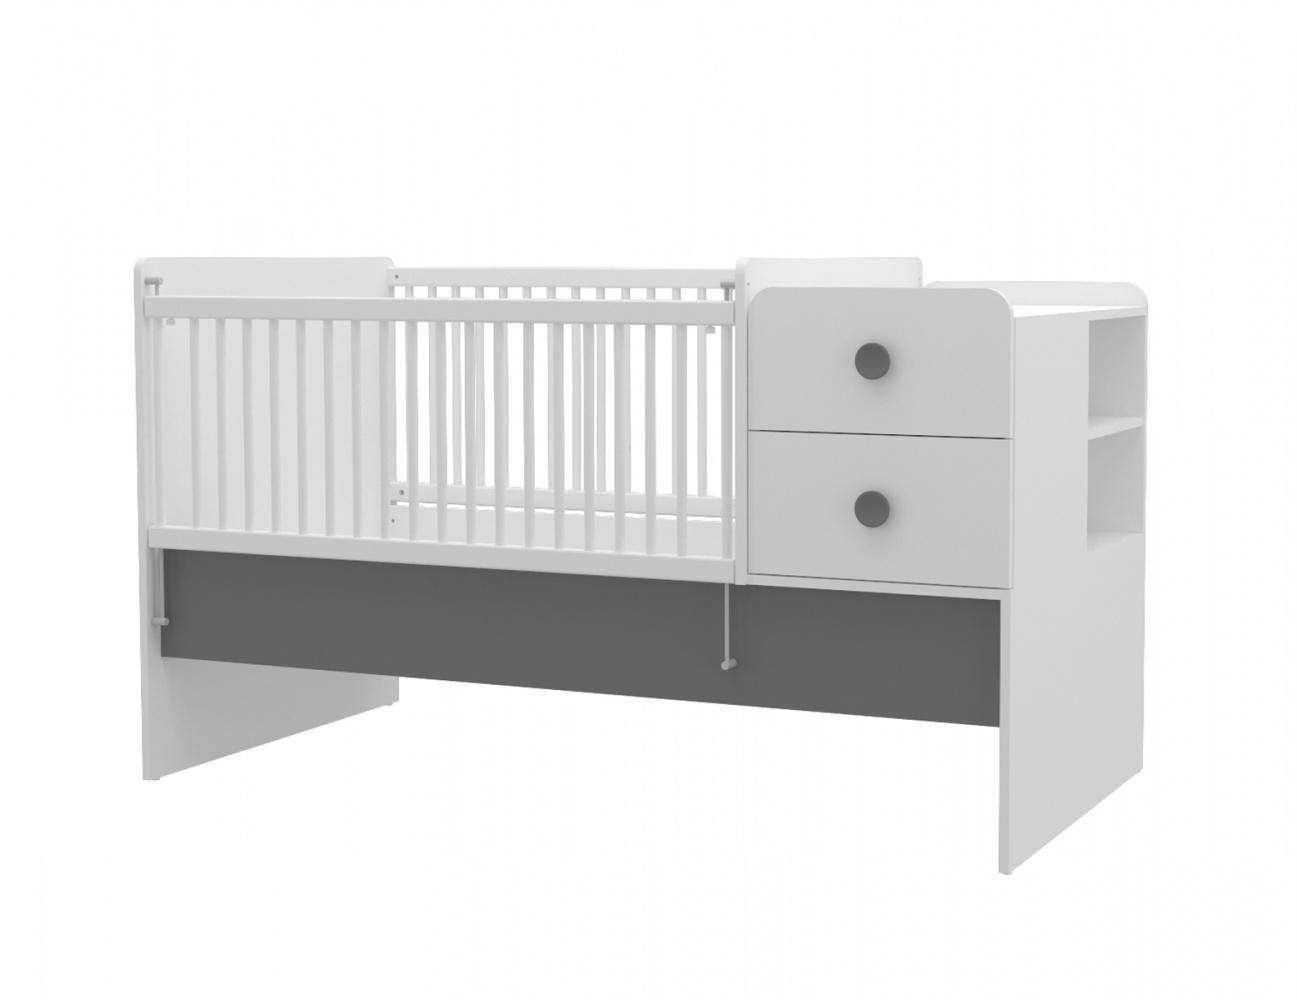 Almila Babybett Baby Cute vergrößerbar 80x130-180